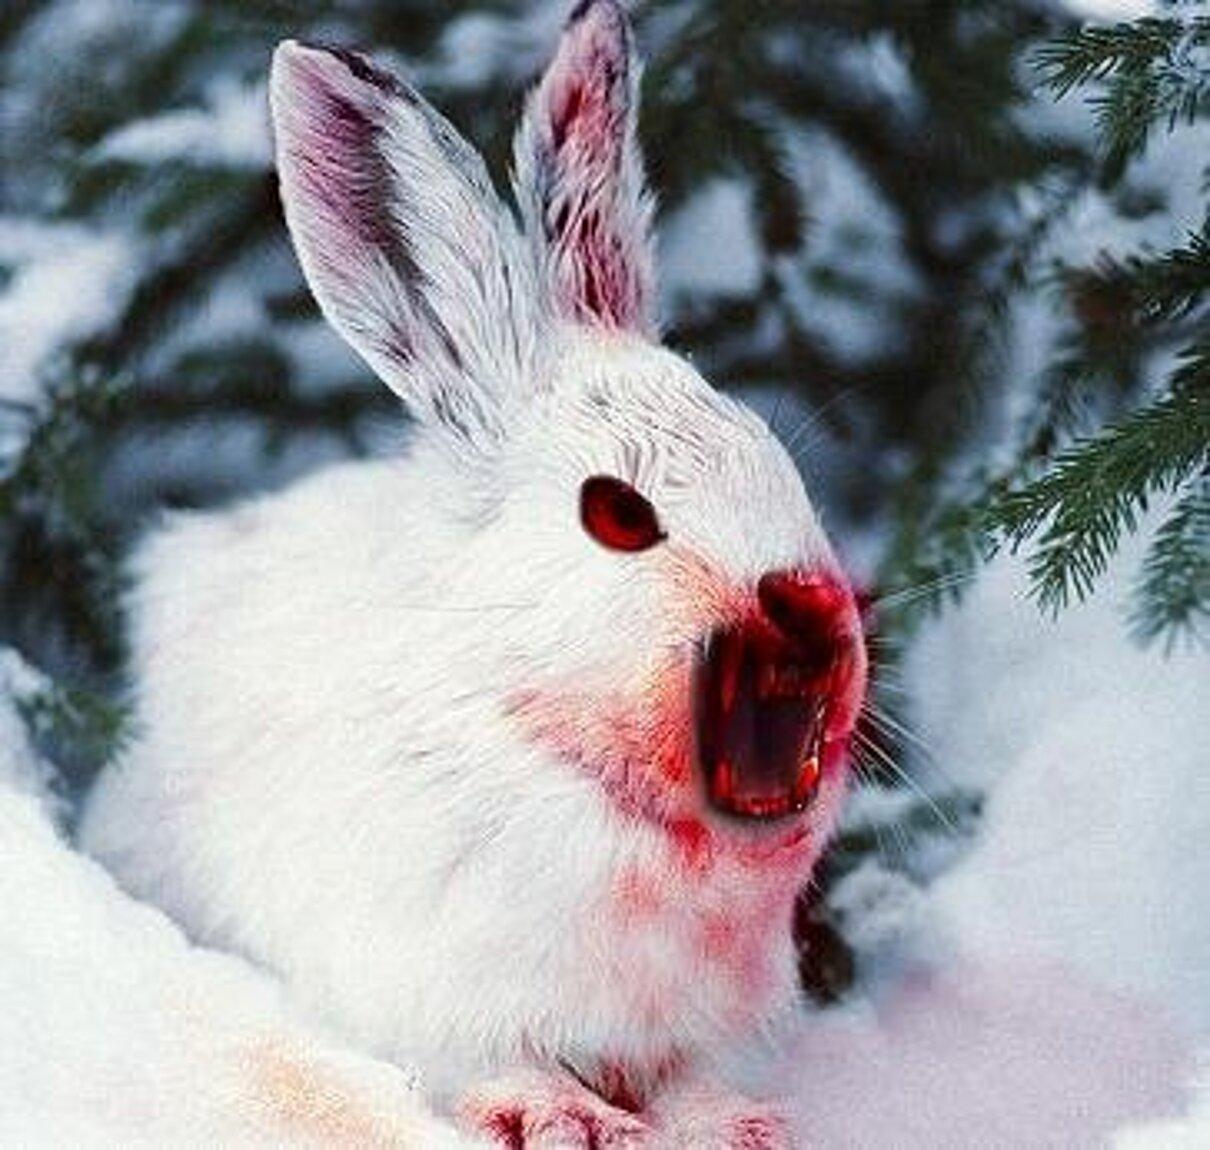 Жалоба-отзыв: Cалихова Юлия Шамилевна - Осторожно, злая собака.  Фото №1